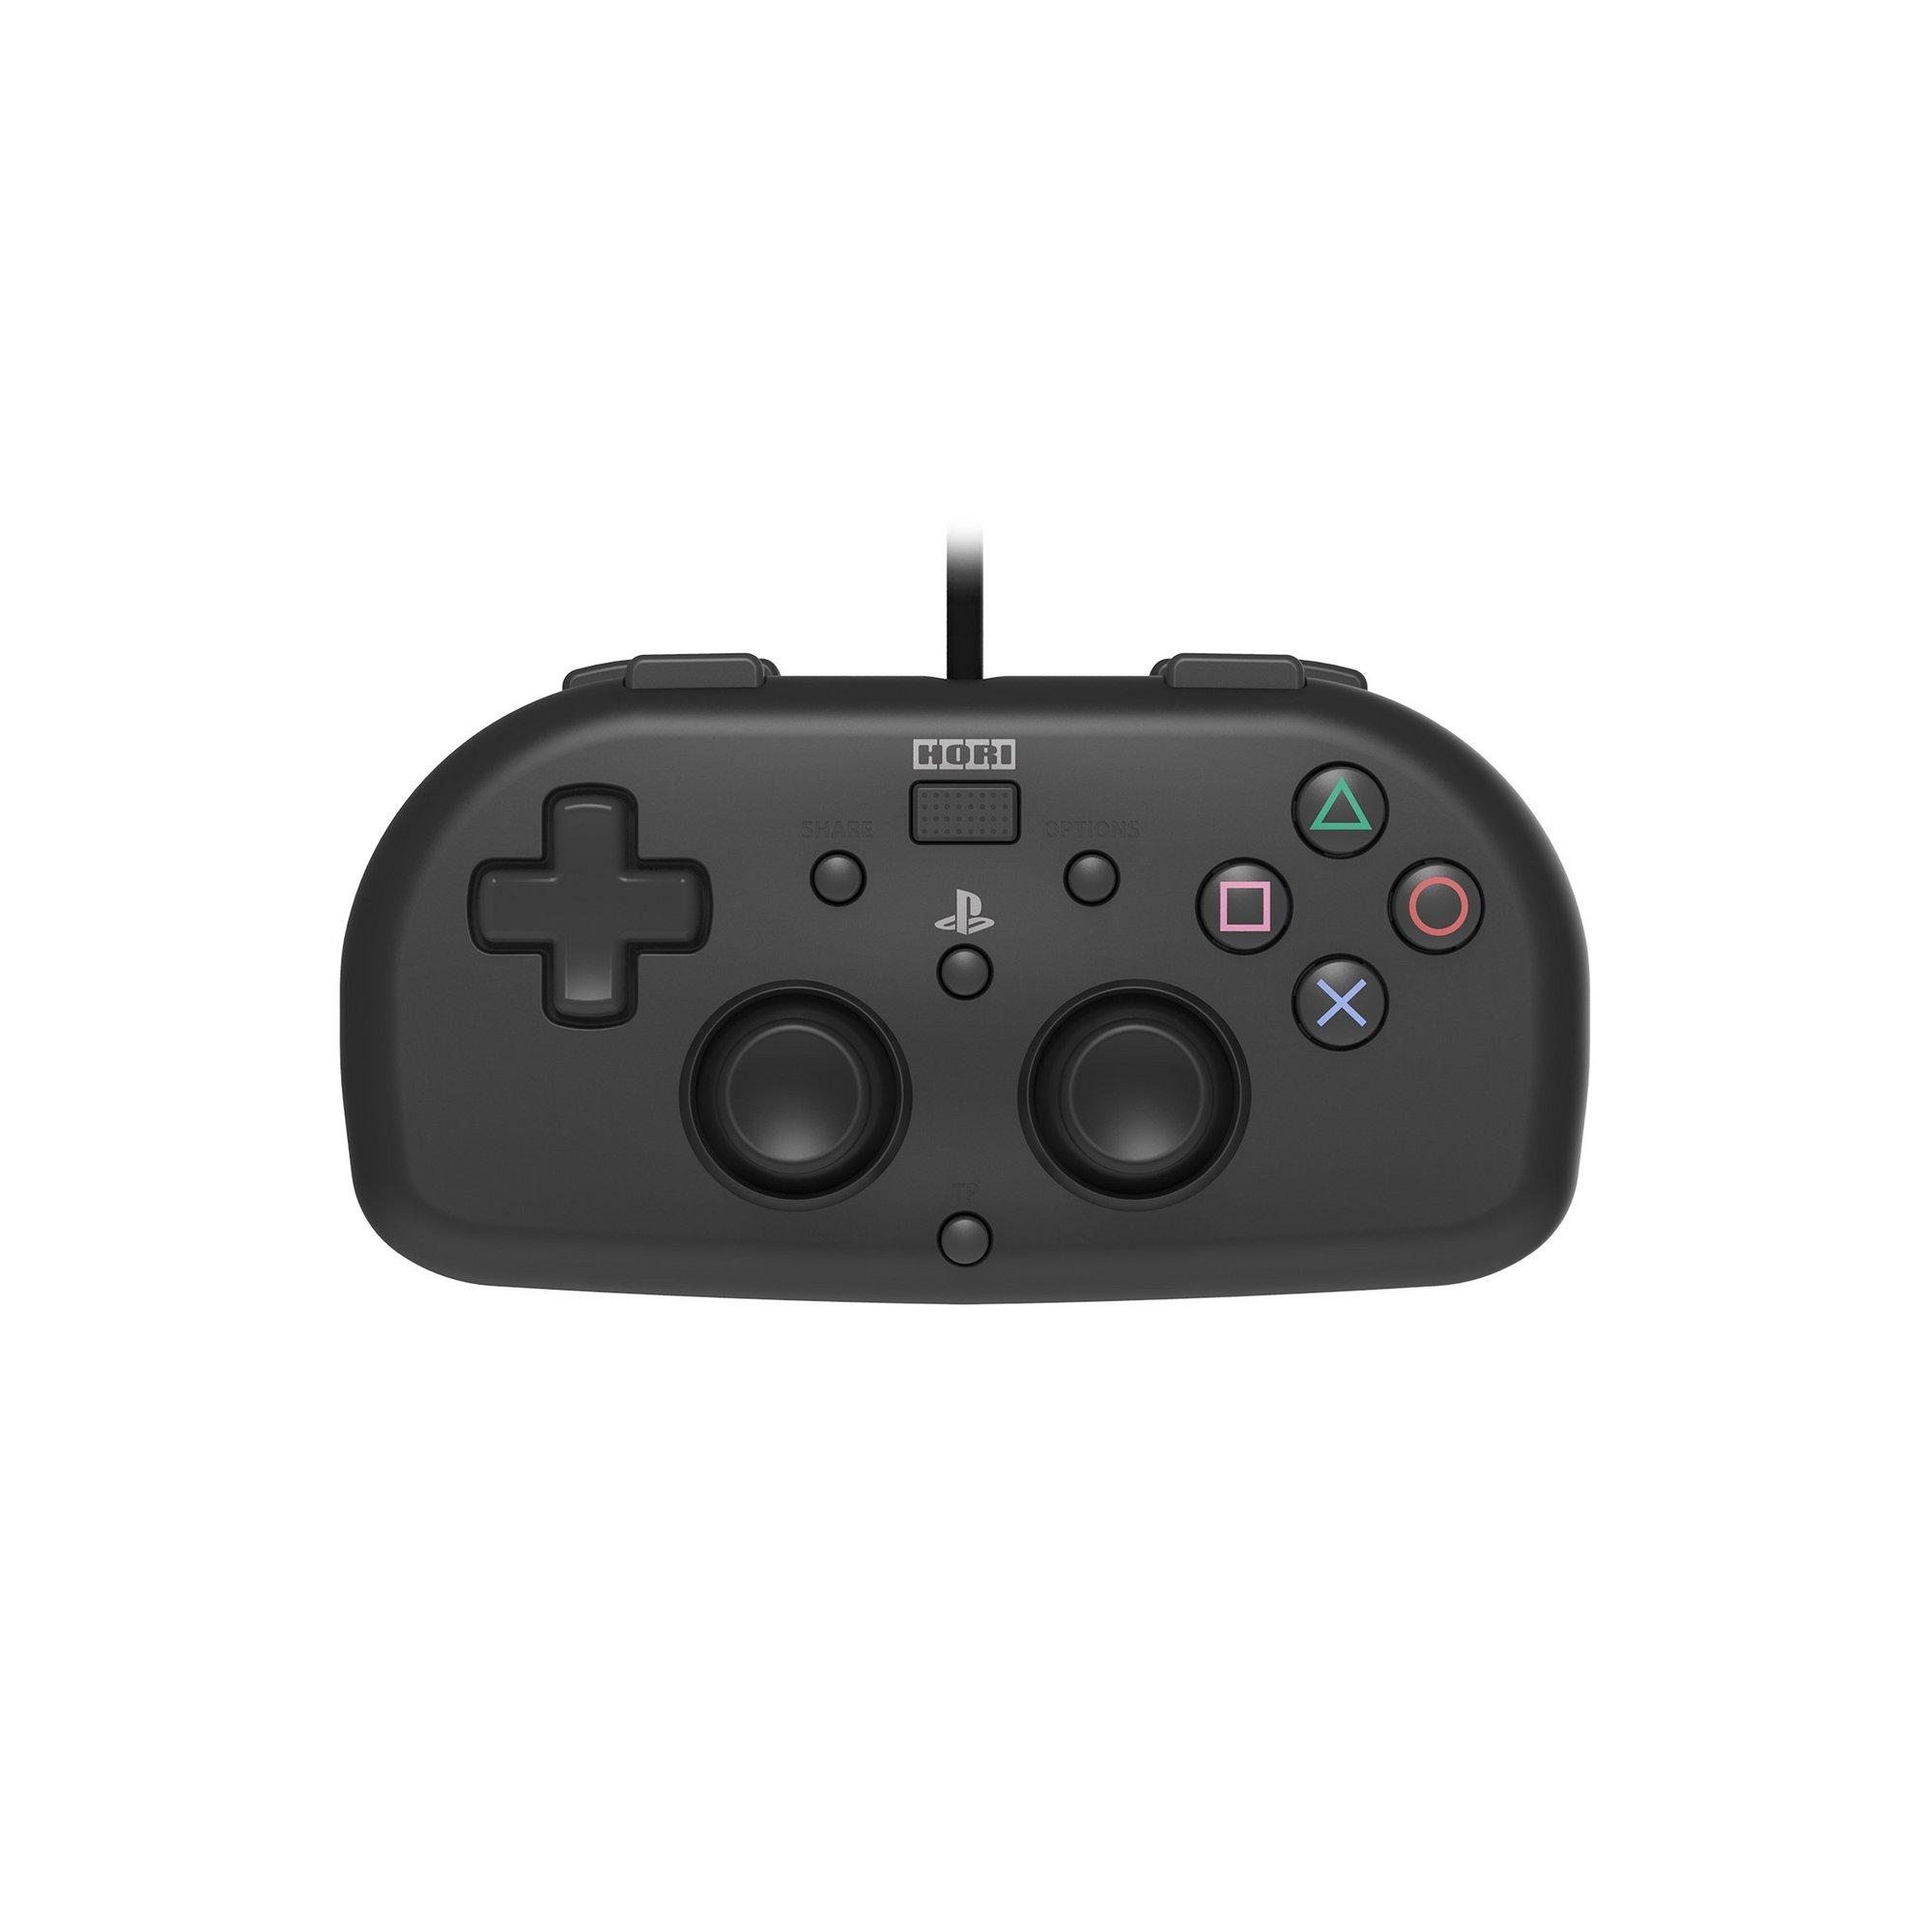 Image of Hori Pad Mini Ps4 Controller Black